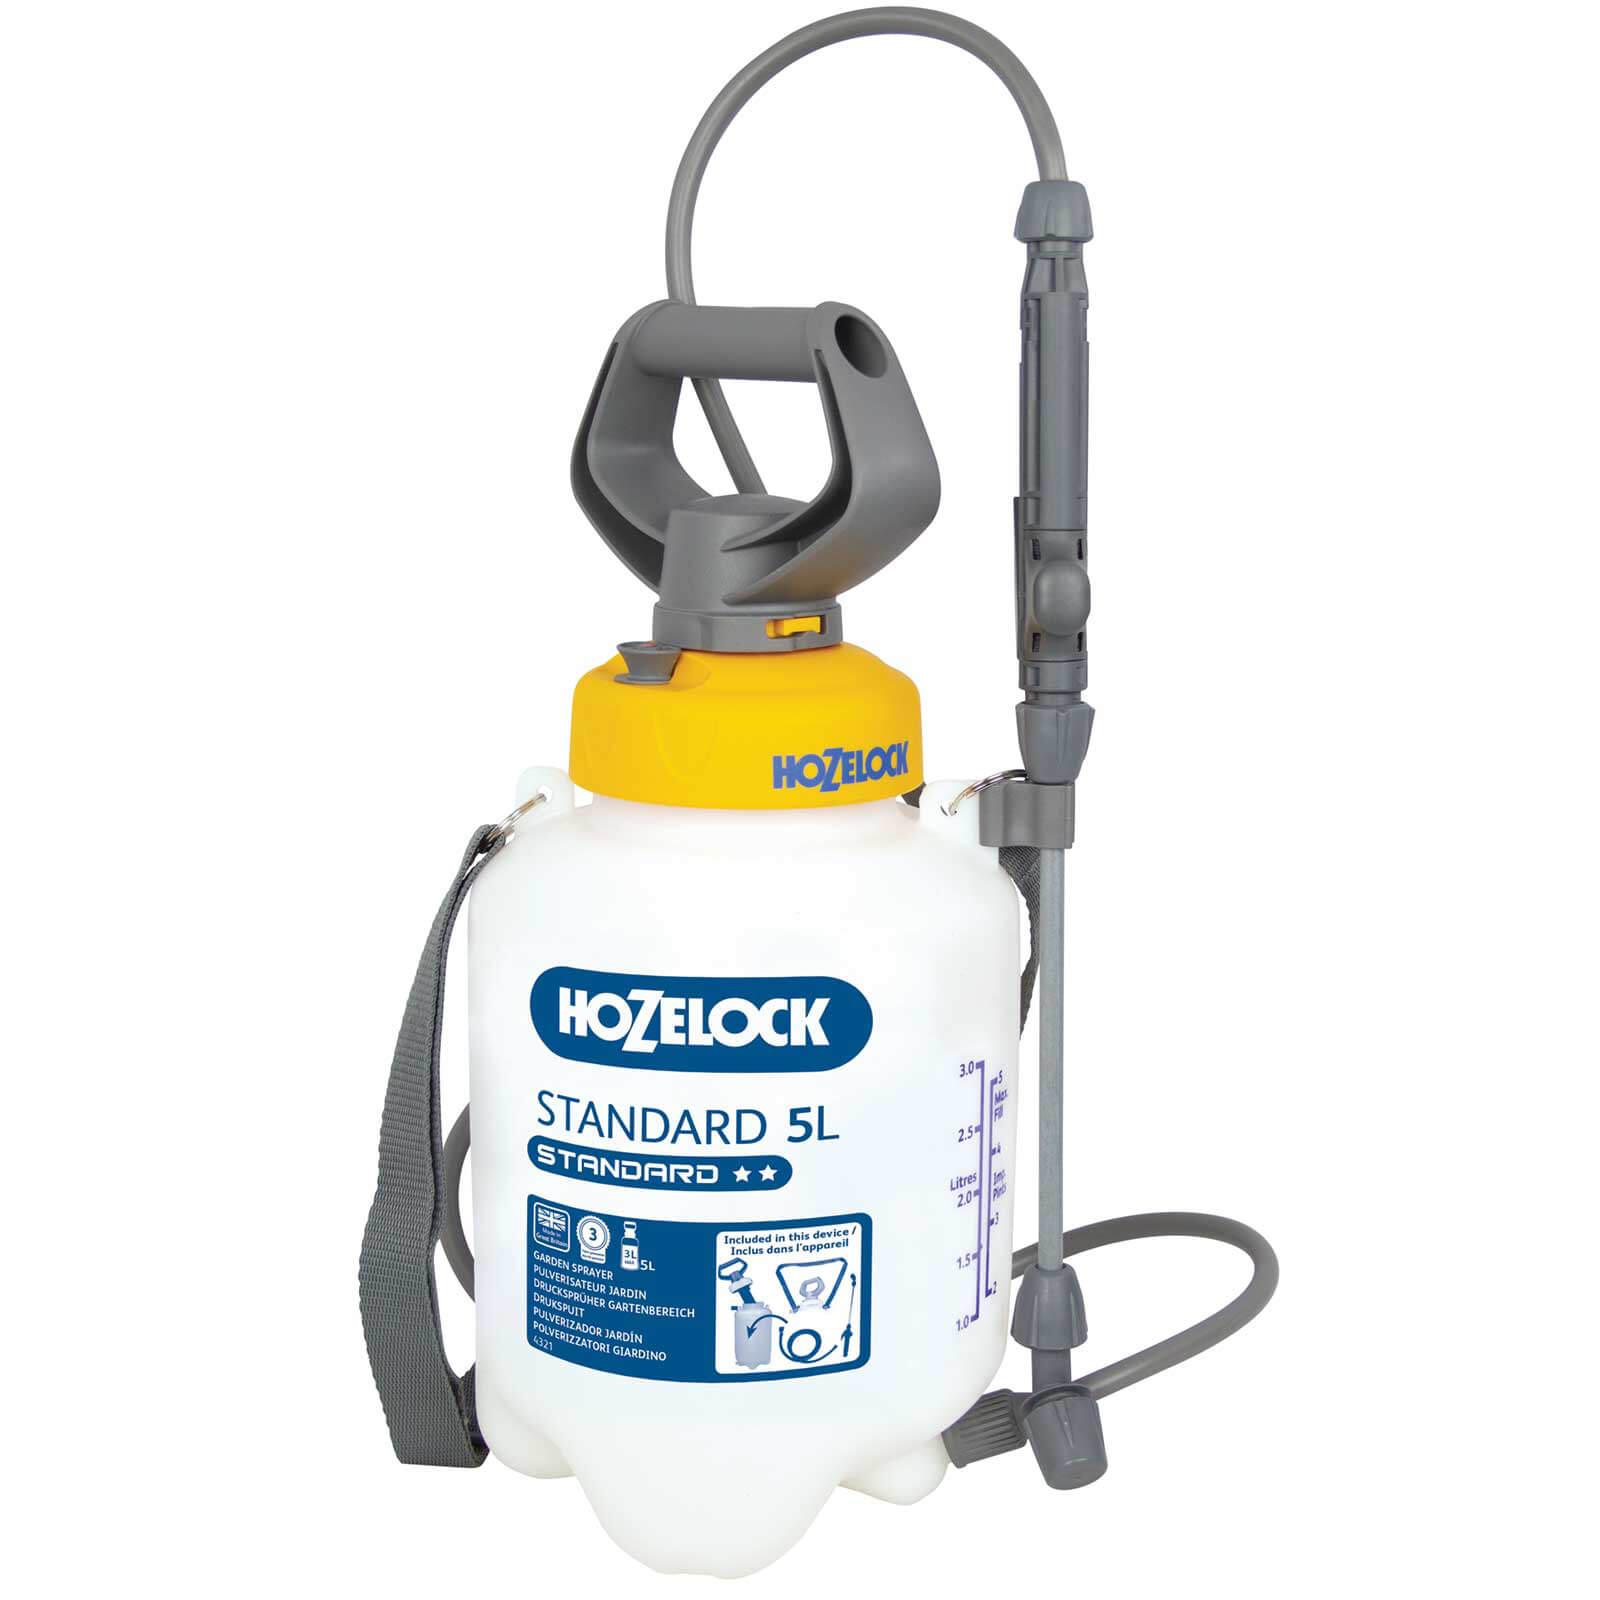 Hozelock STANDARD Water Pressure Sprayer 5l